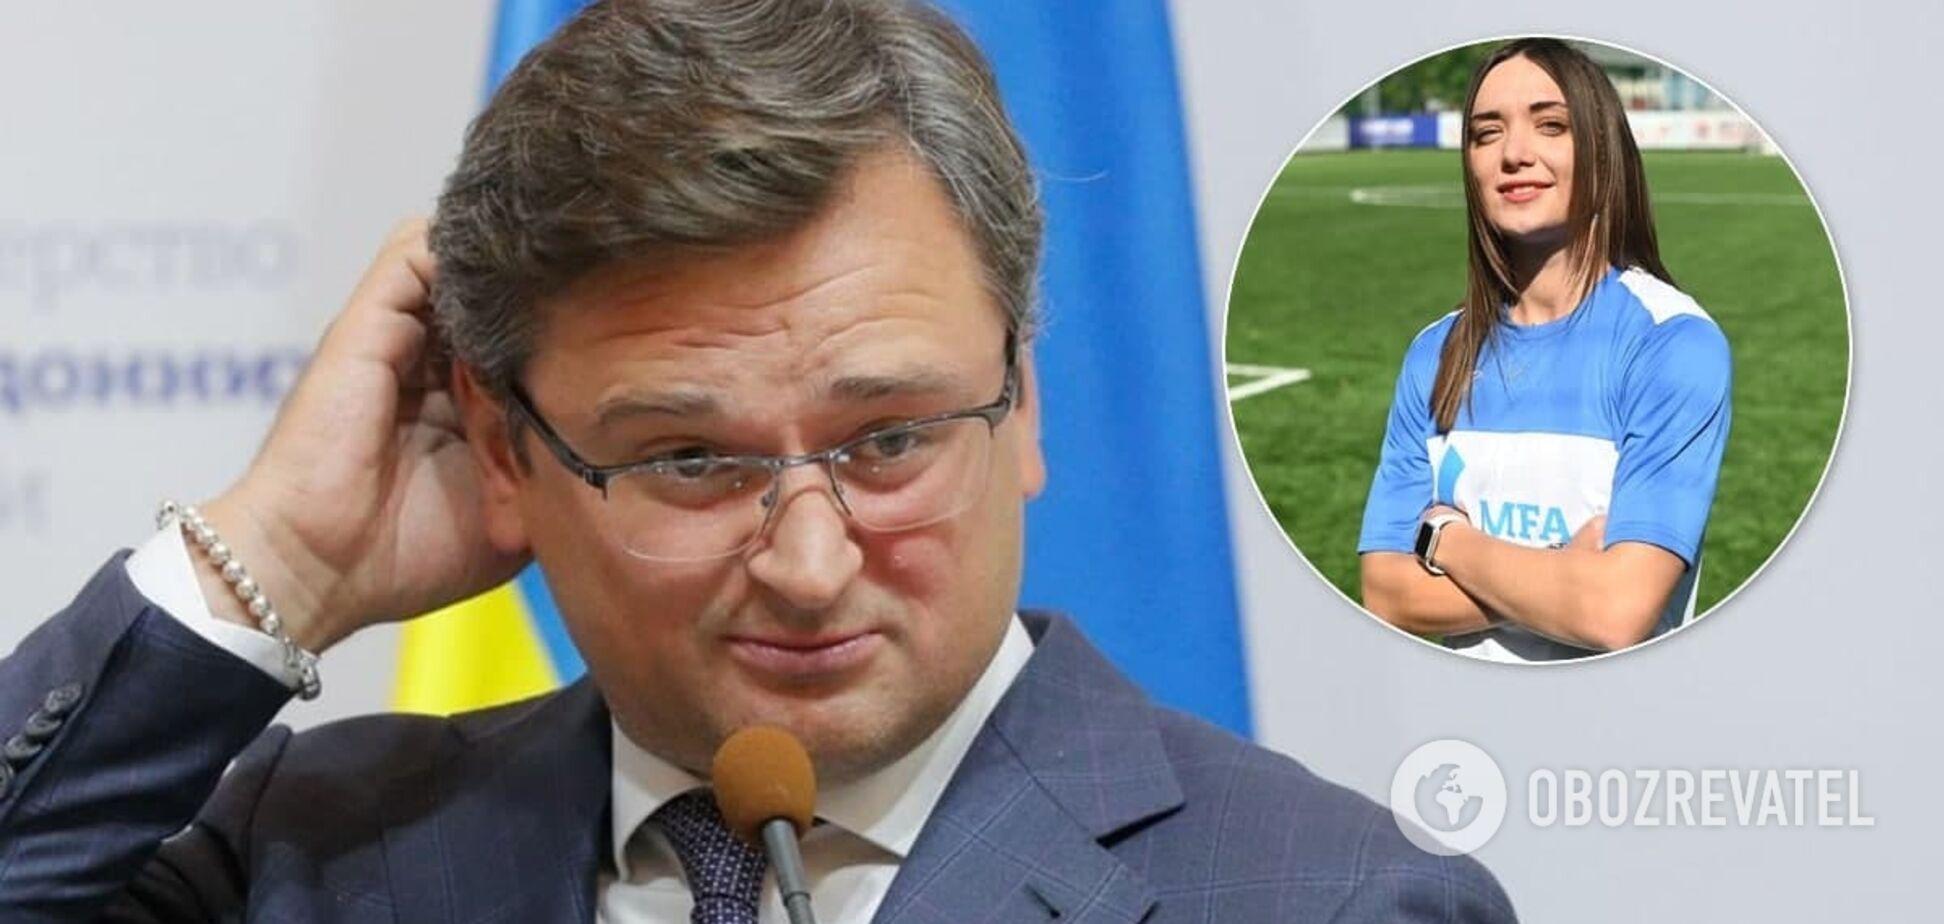 Советник Кулебы вела страницу Вконтакте